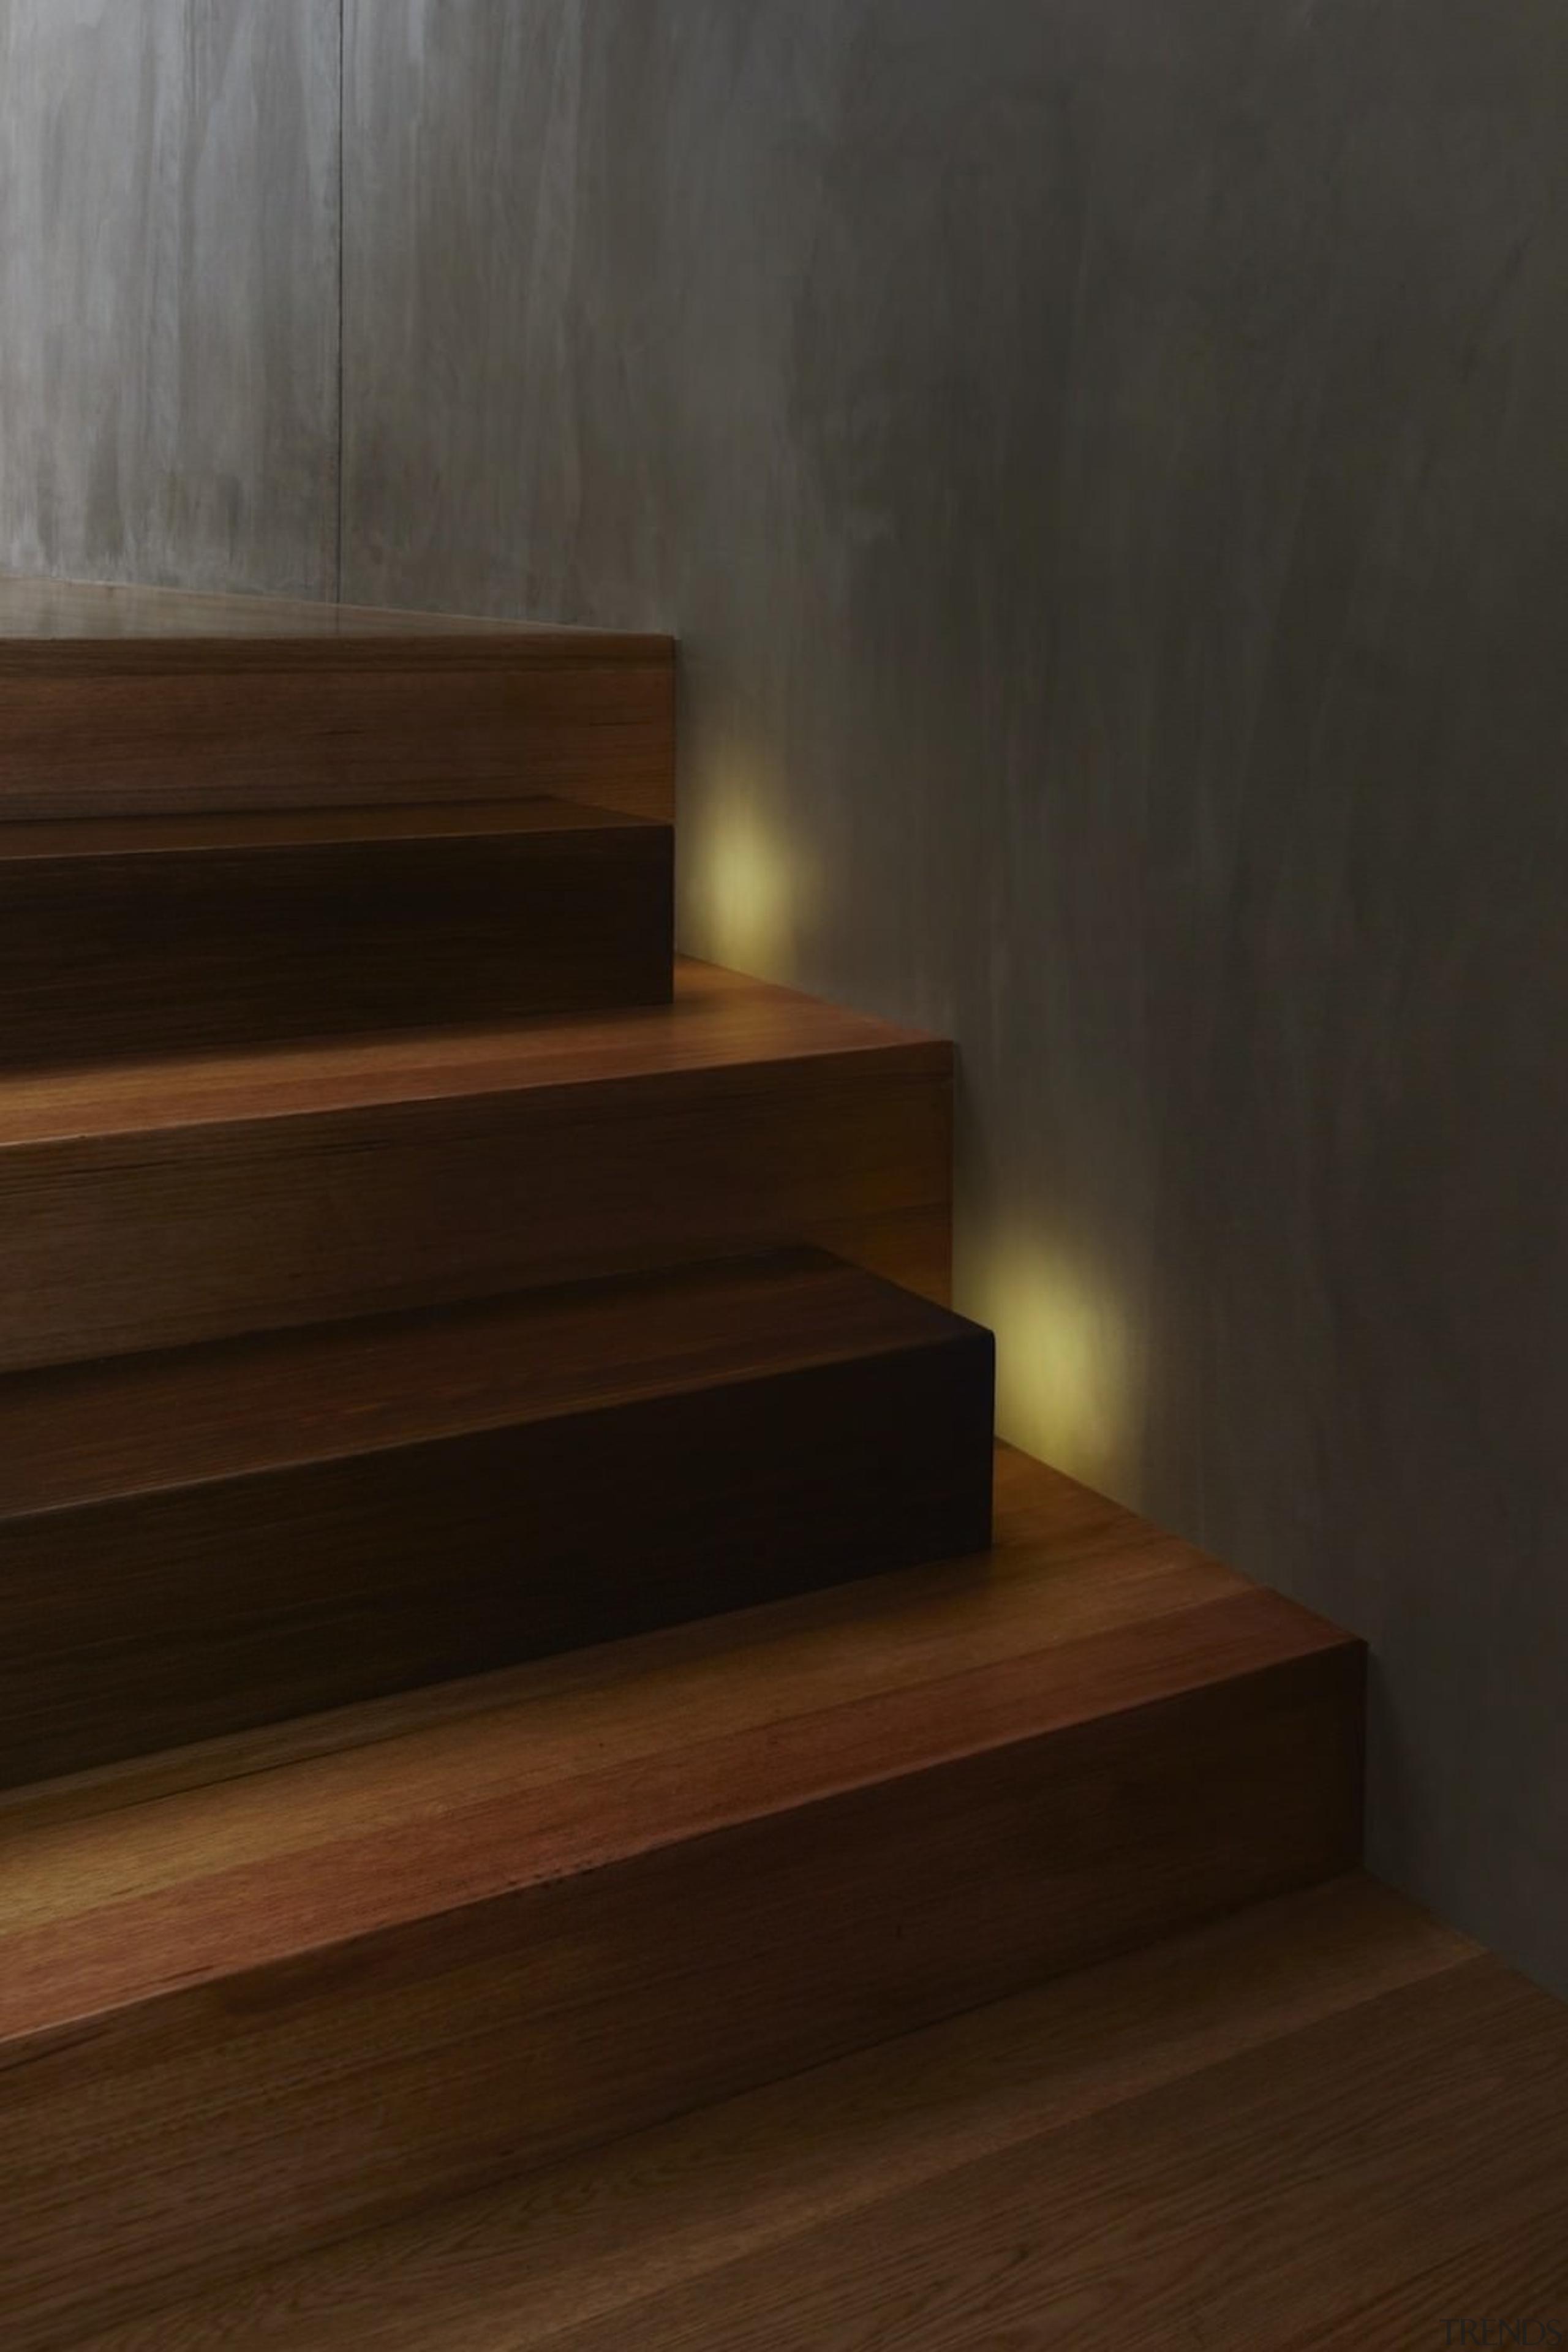 Watch your step – hidden lights face the floor, flooring, hardwood, interior design, laminate flooring, light, lighting, stairs, wall, wood, wood flooring, wood stain, brown, black